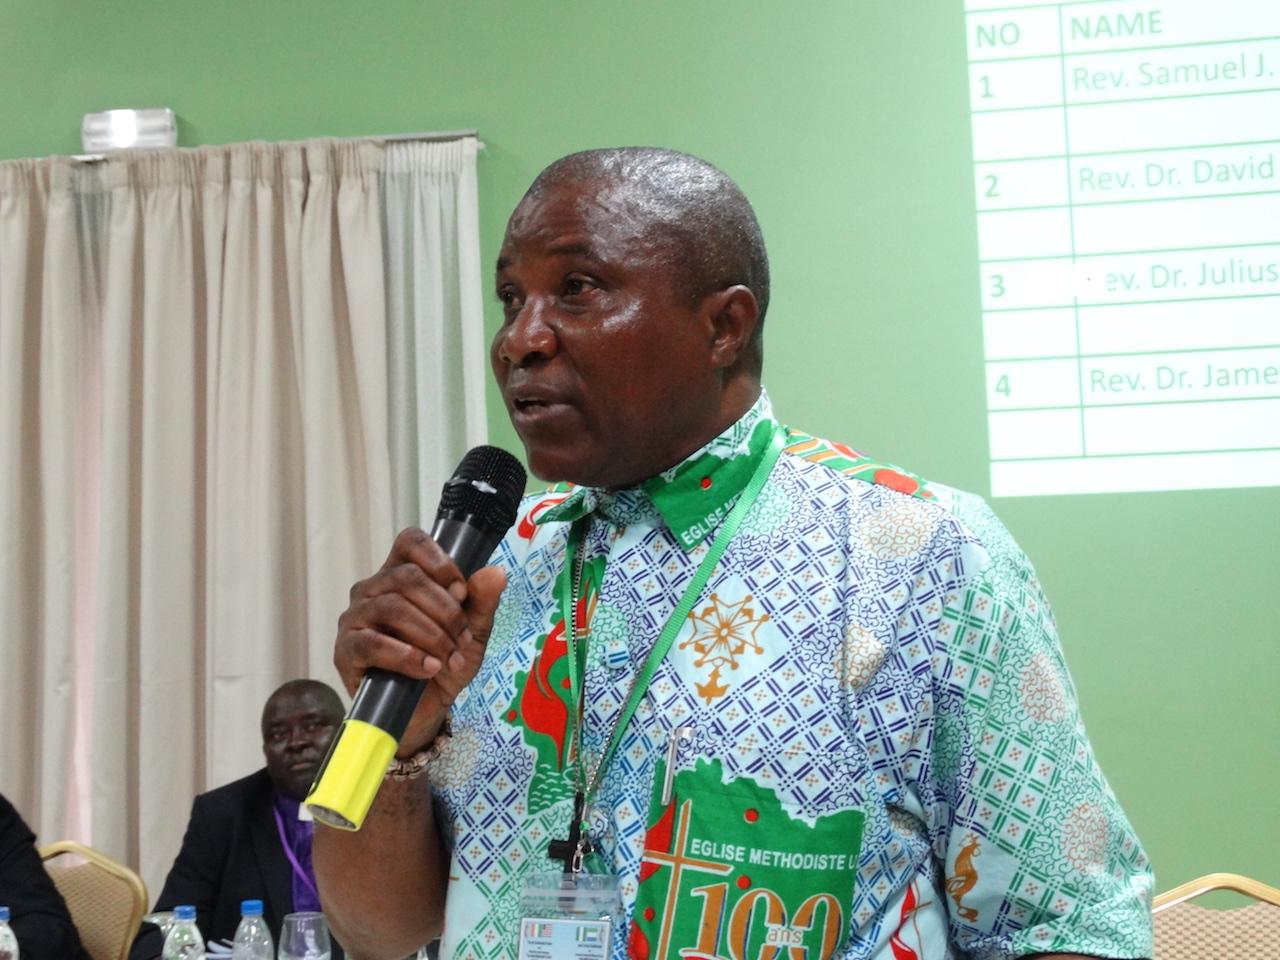 Bishop-elect Samuel J. Quire addresses West Africa Central Conference delegates after his election. Photo by Julu Swen, UMNS